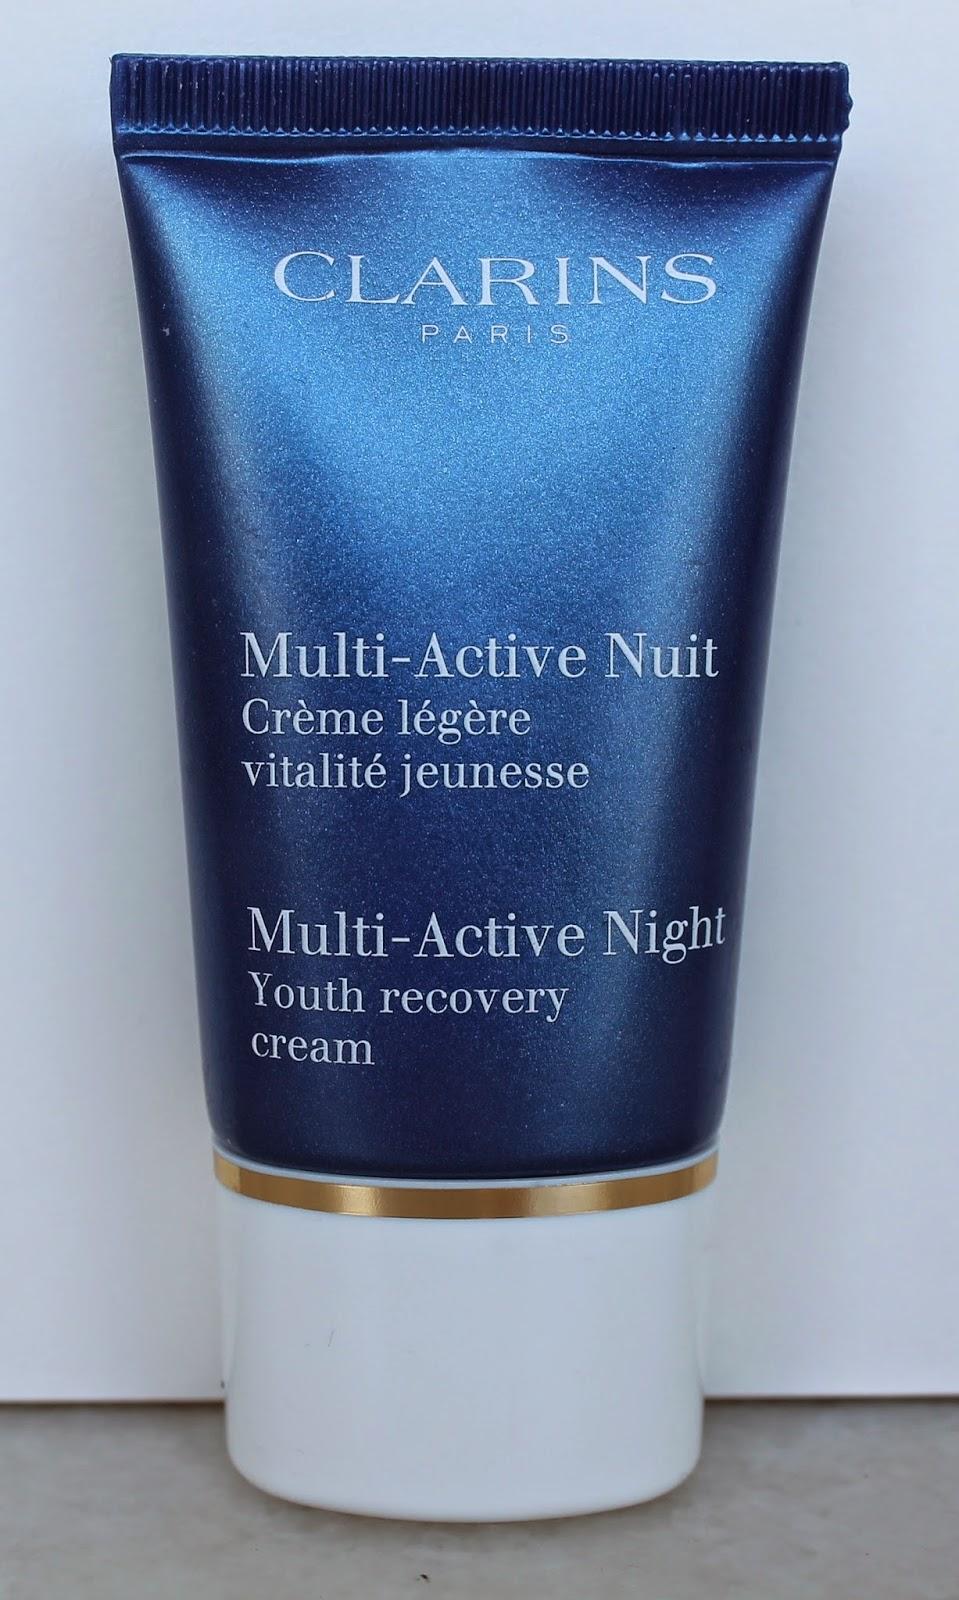 Multi-Active Nuit de Clarins